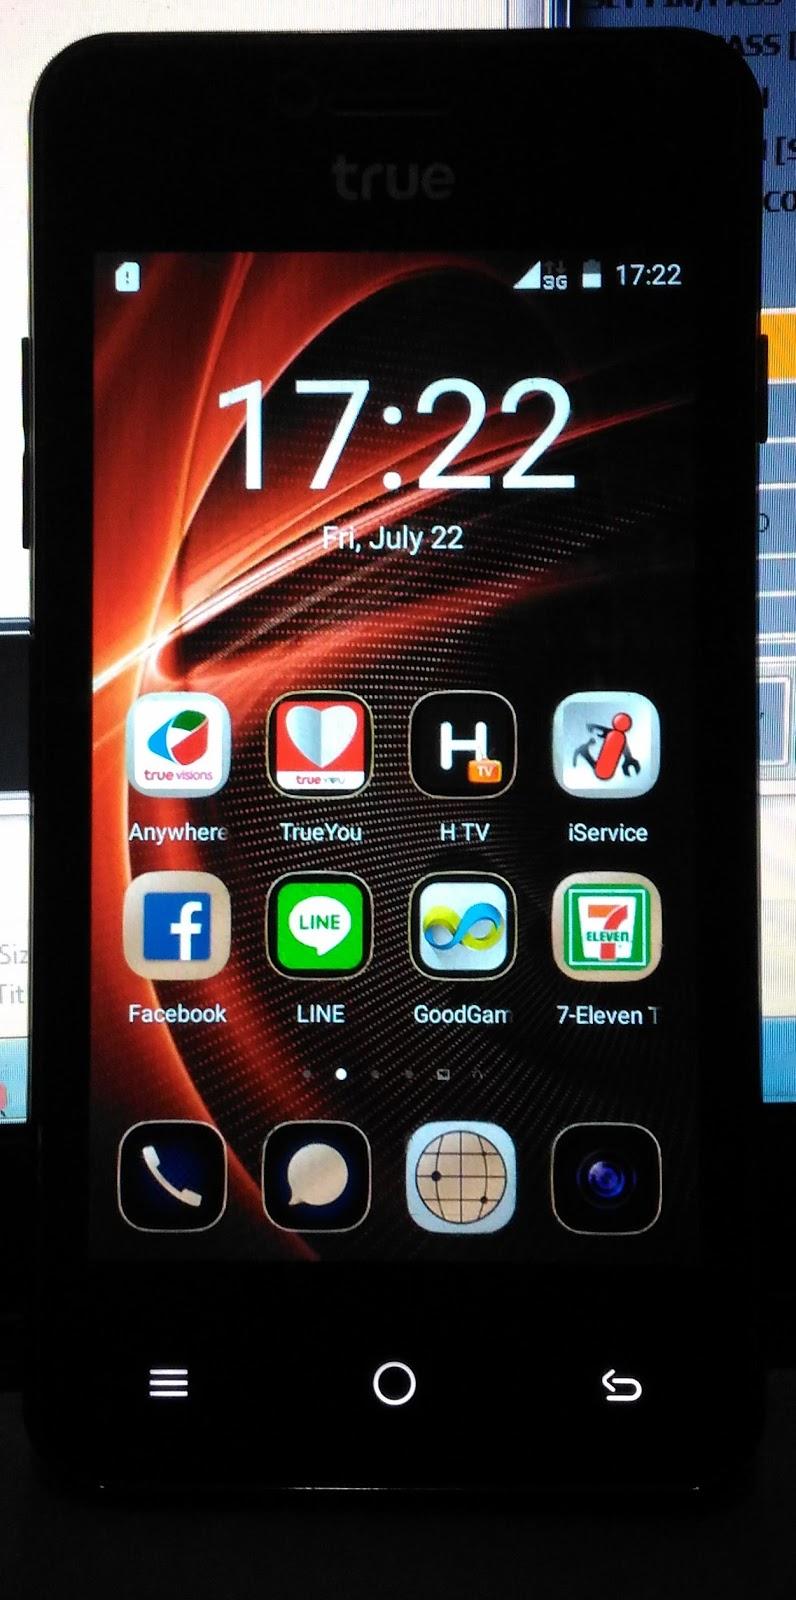 Android Usb Driver Rar